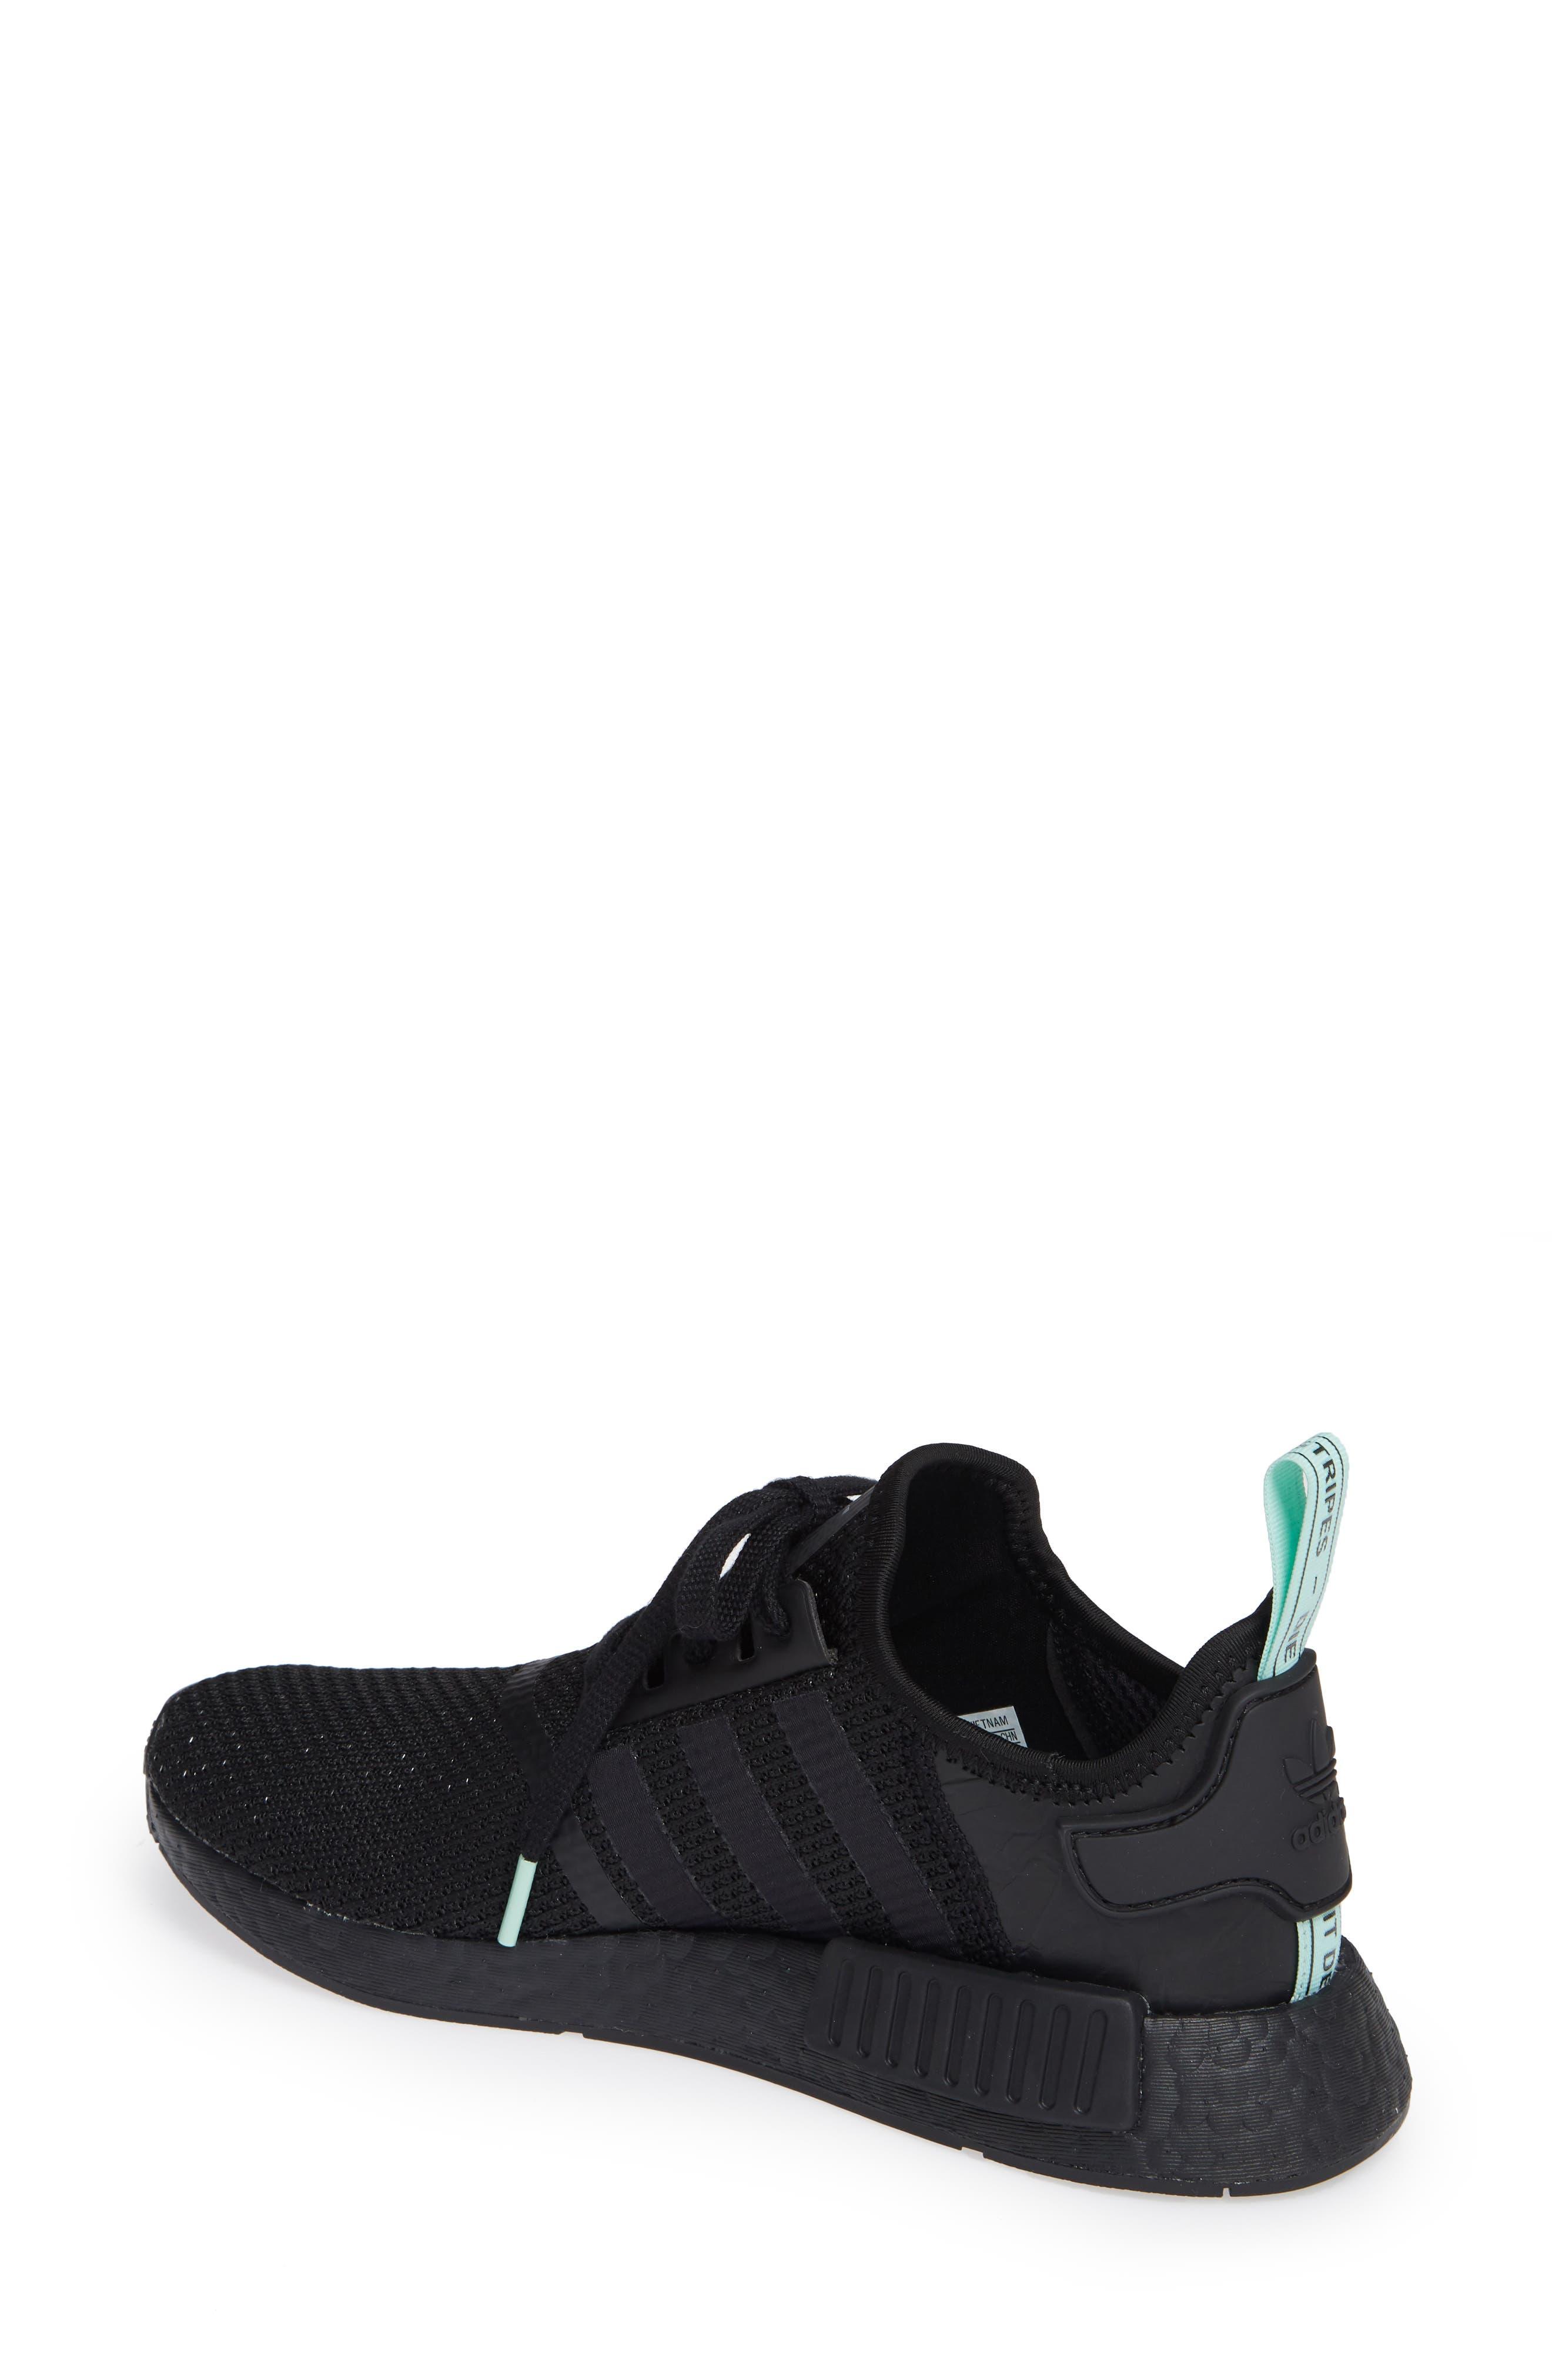 NMD R1 Athletic Shoe,                             Alternate thumbnail 2, color,                             BLACK/ BLACK/ CLEAR MINT